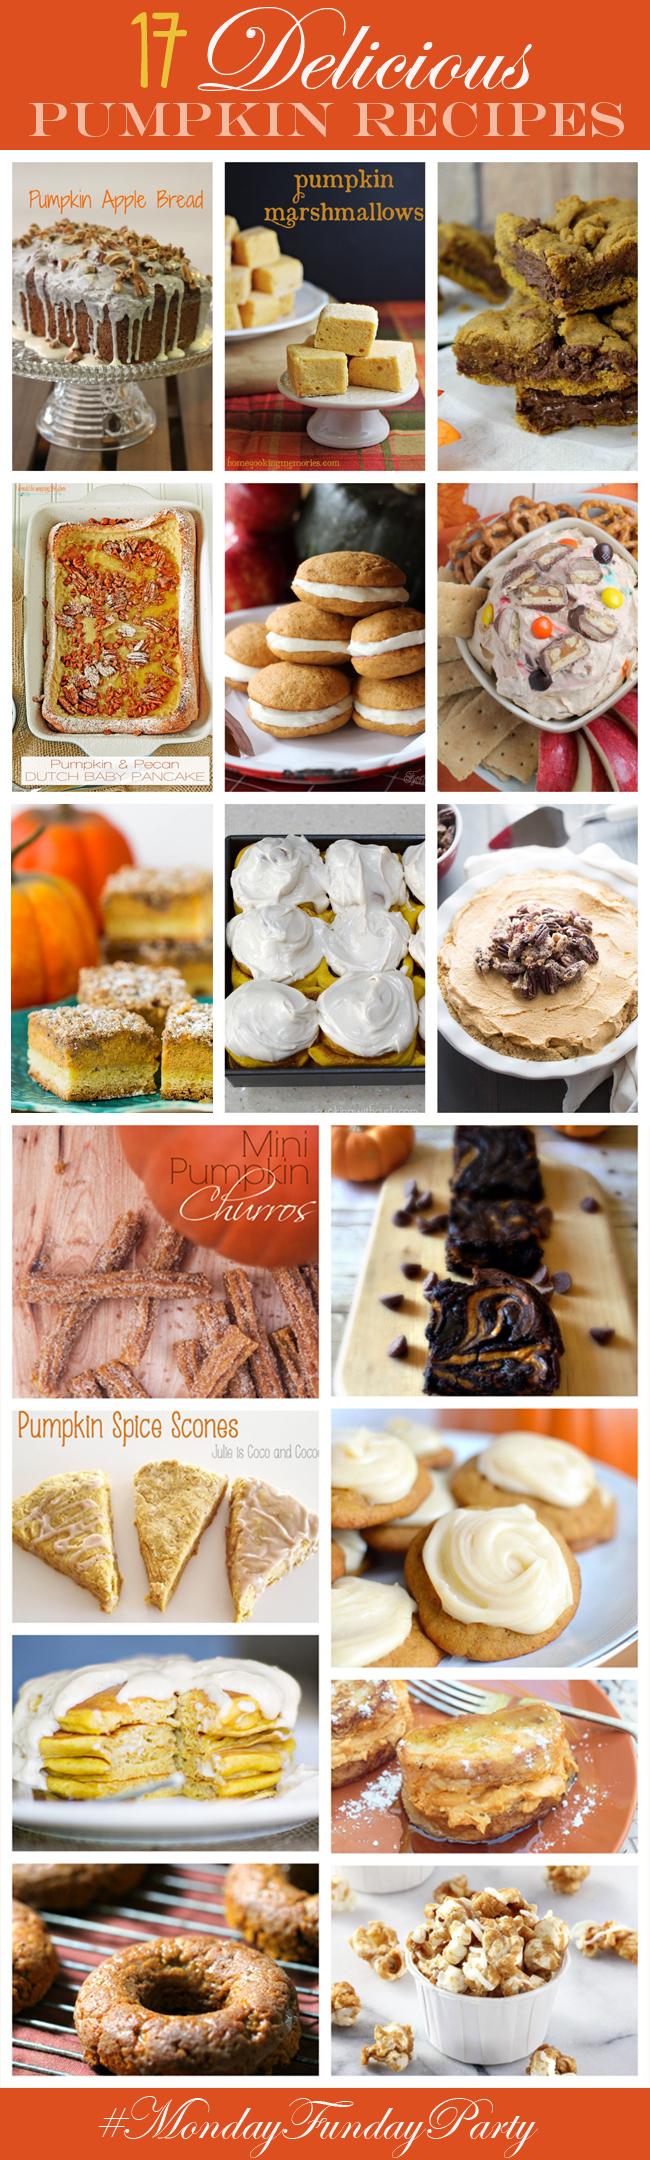 17 Delicious Pumpkin Recipe Ideas #MondayFundayParty